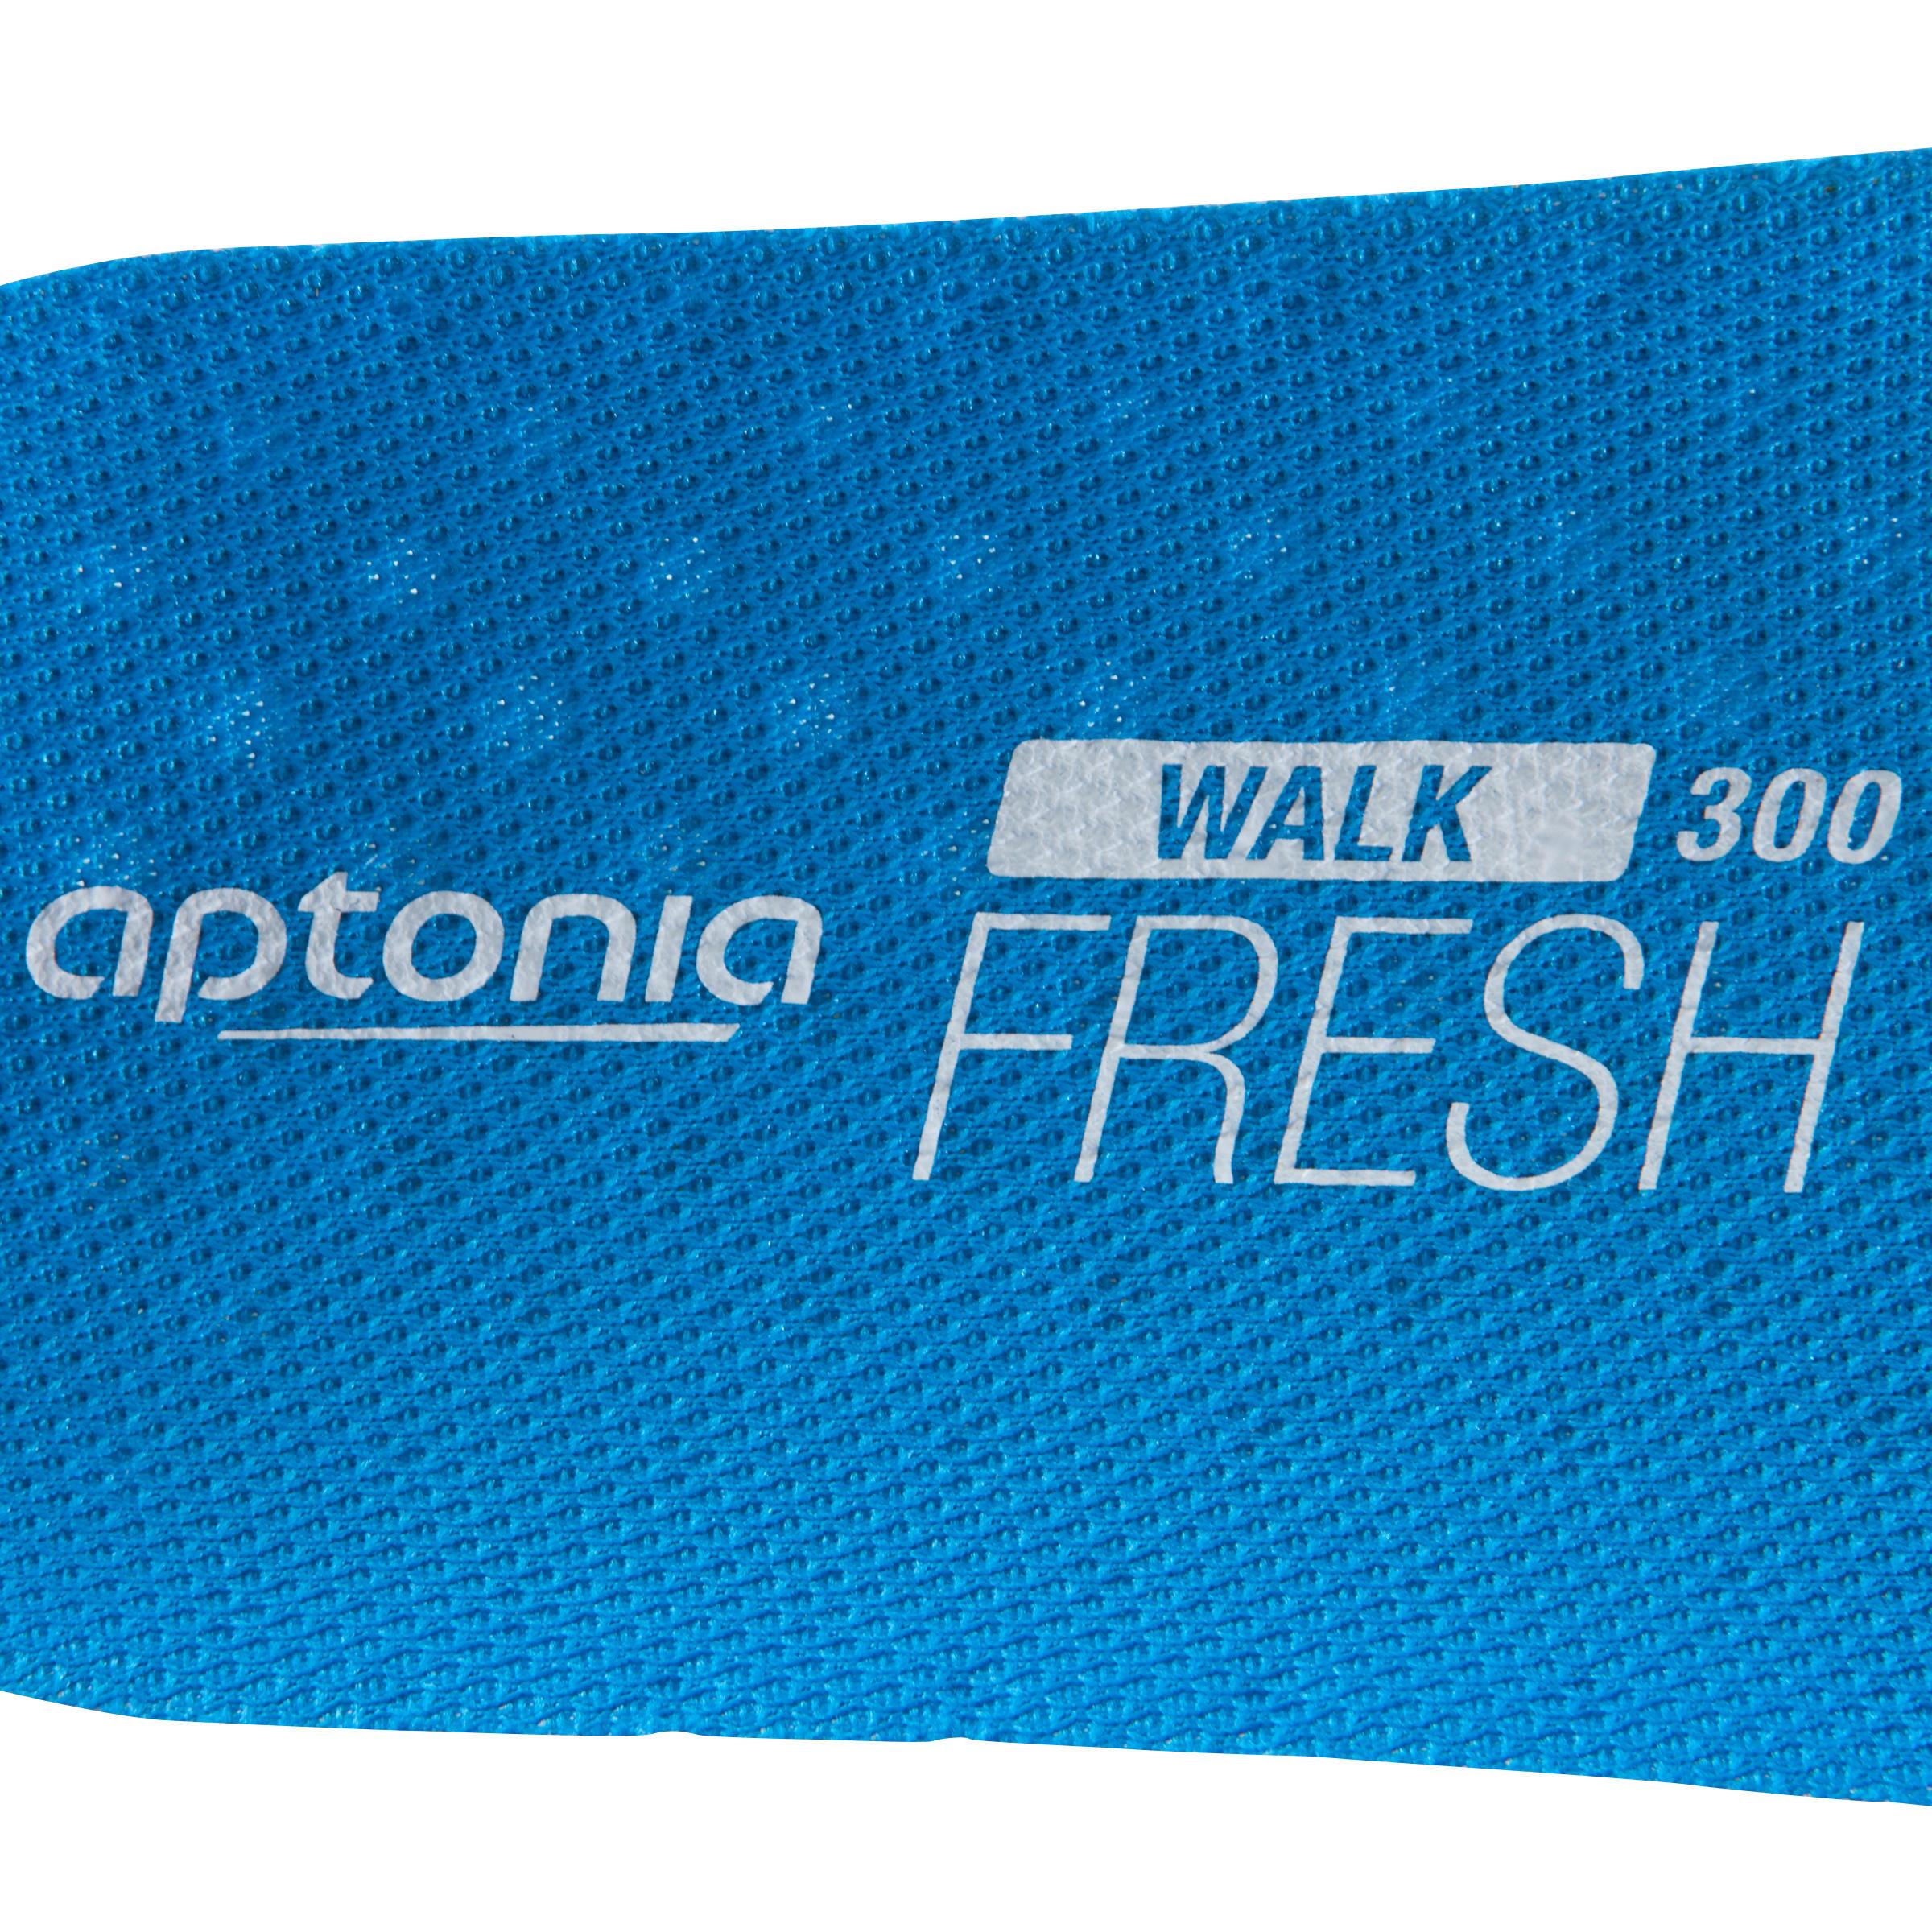 Insoles Walk300 - Blue